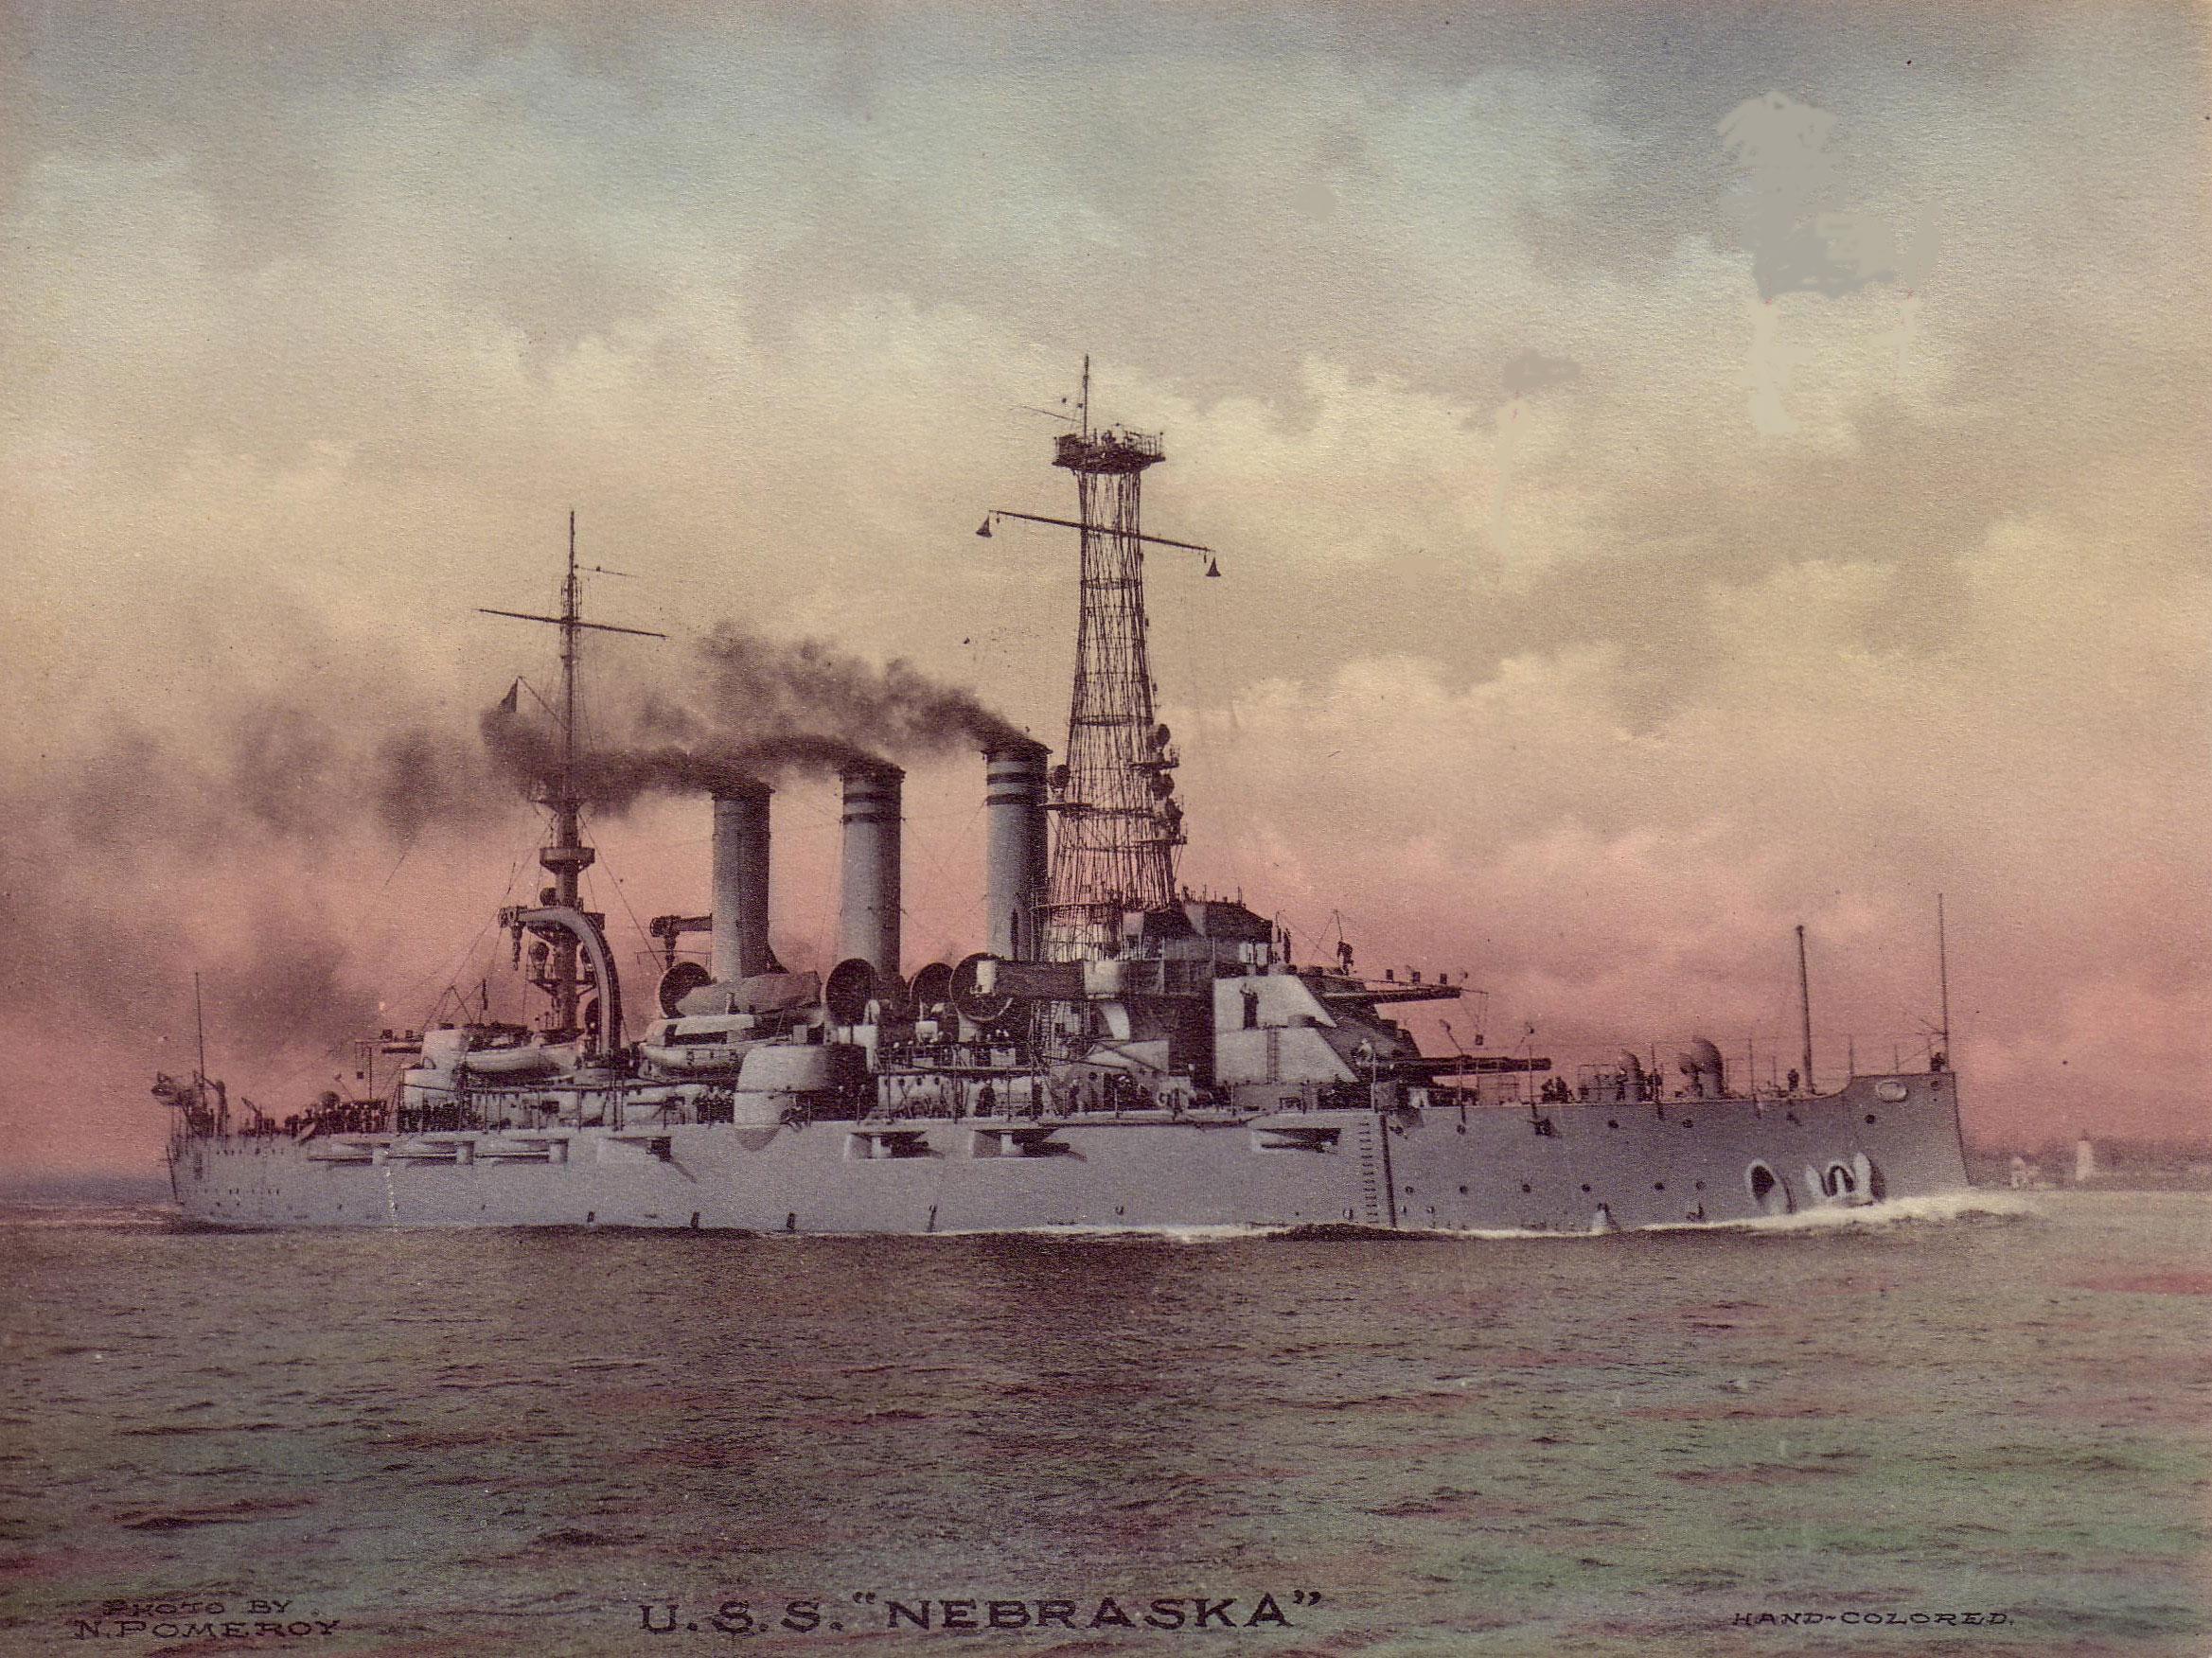 Nebraska_Tint post 1909